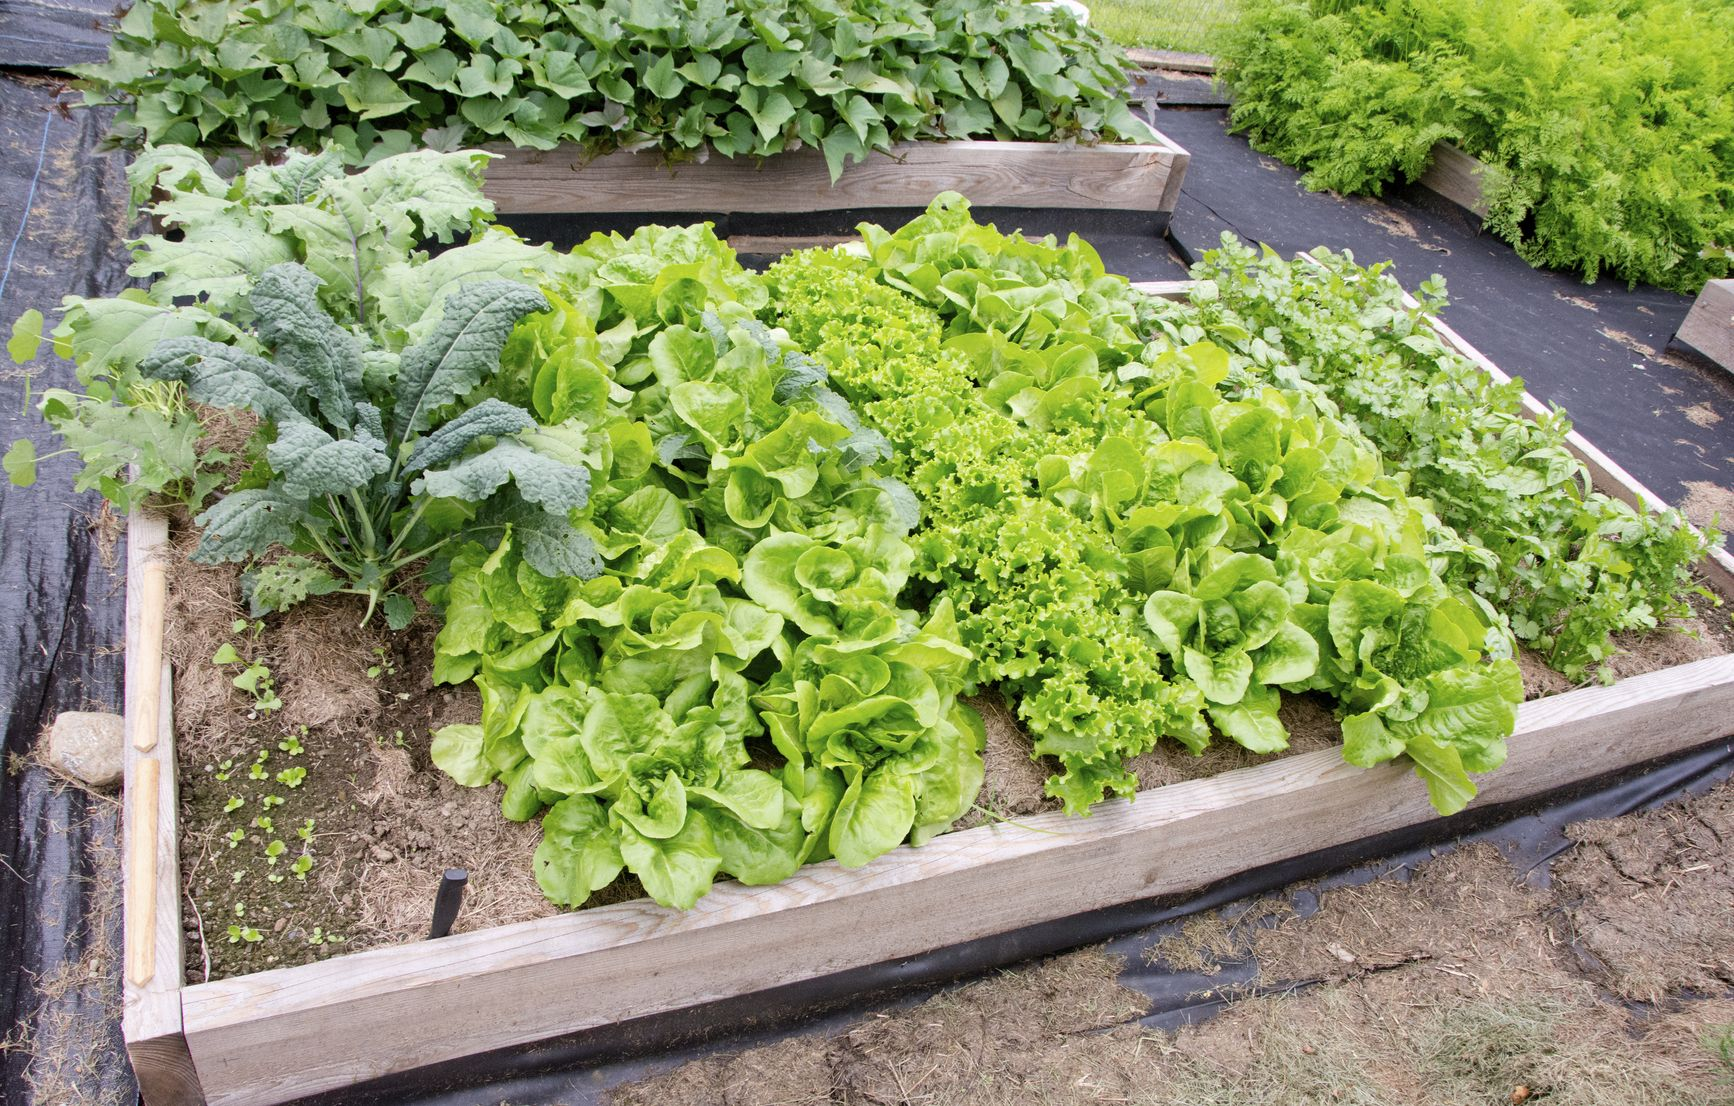 kale companion planting u2013 what are good companion plants for kale